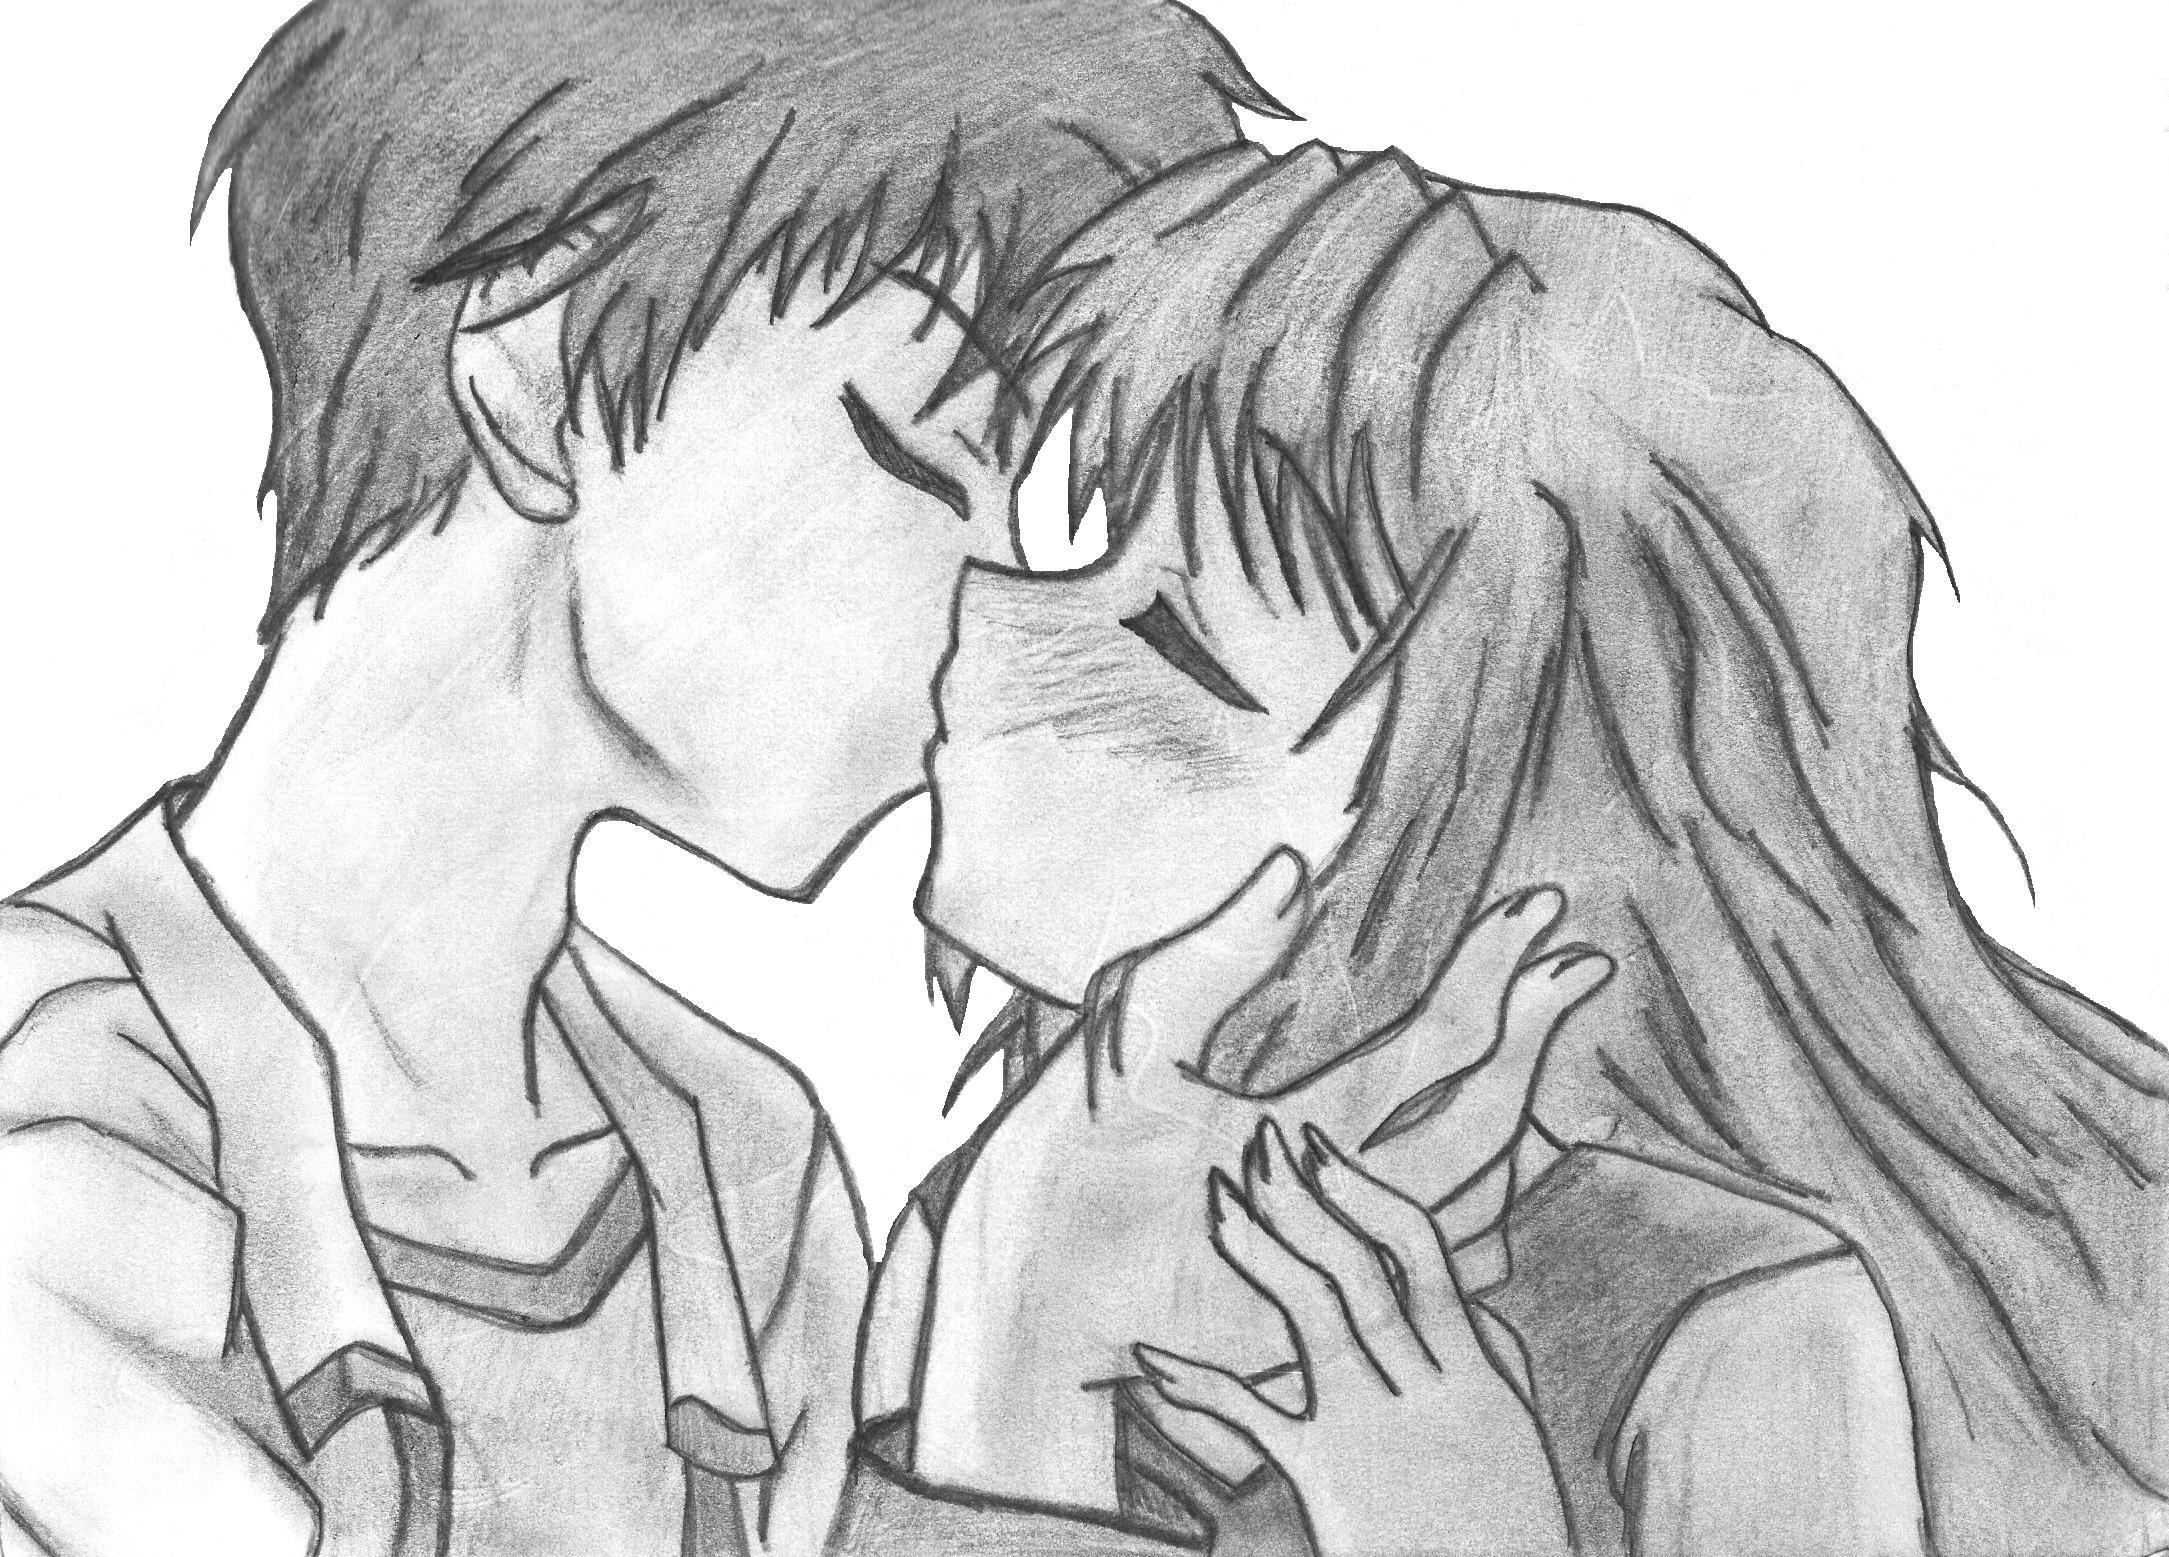 Drawn kisses anime draw Anime Art HD Wallpaper